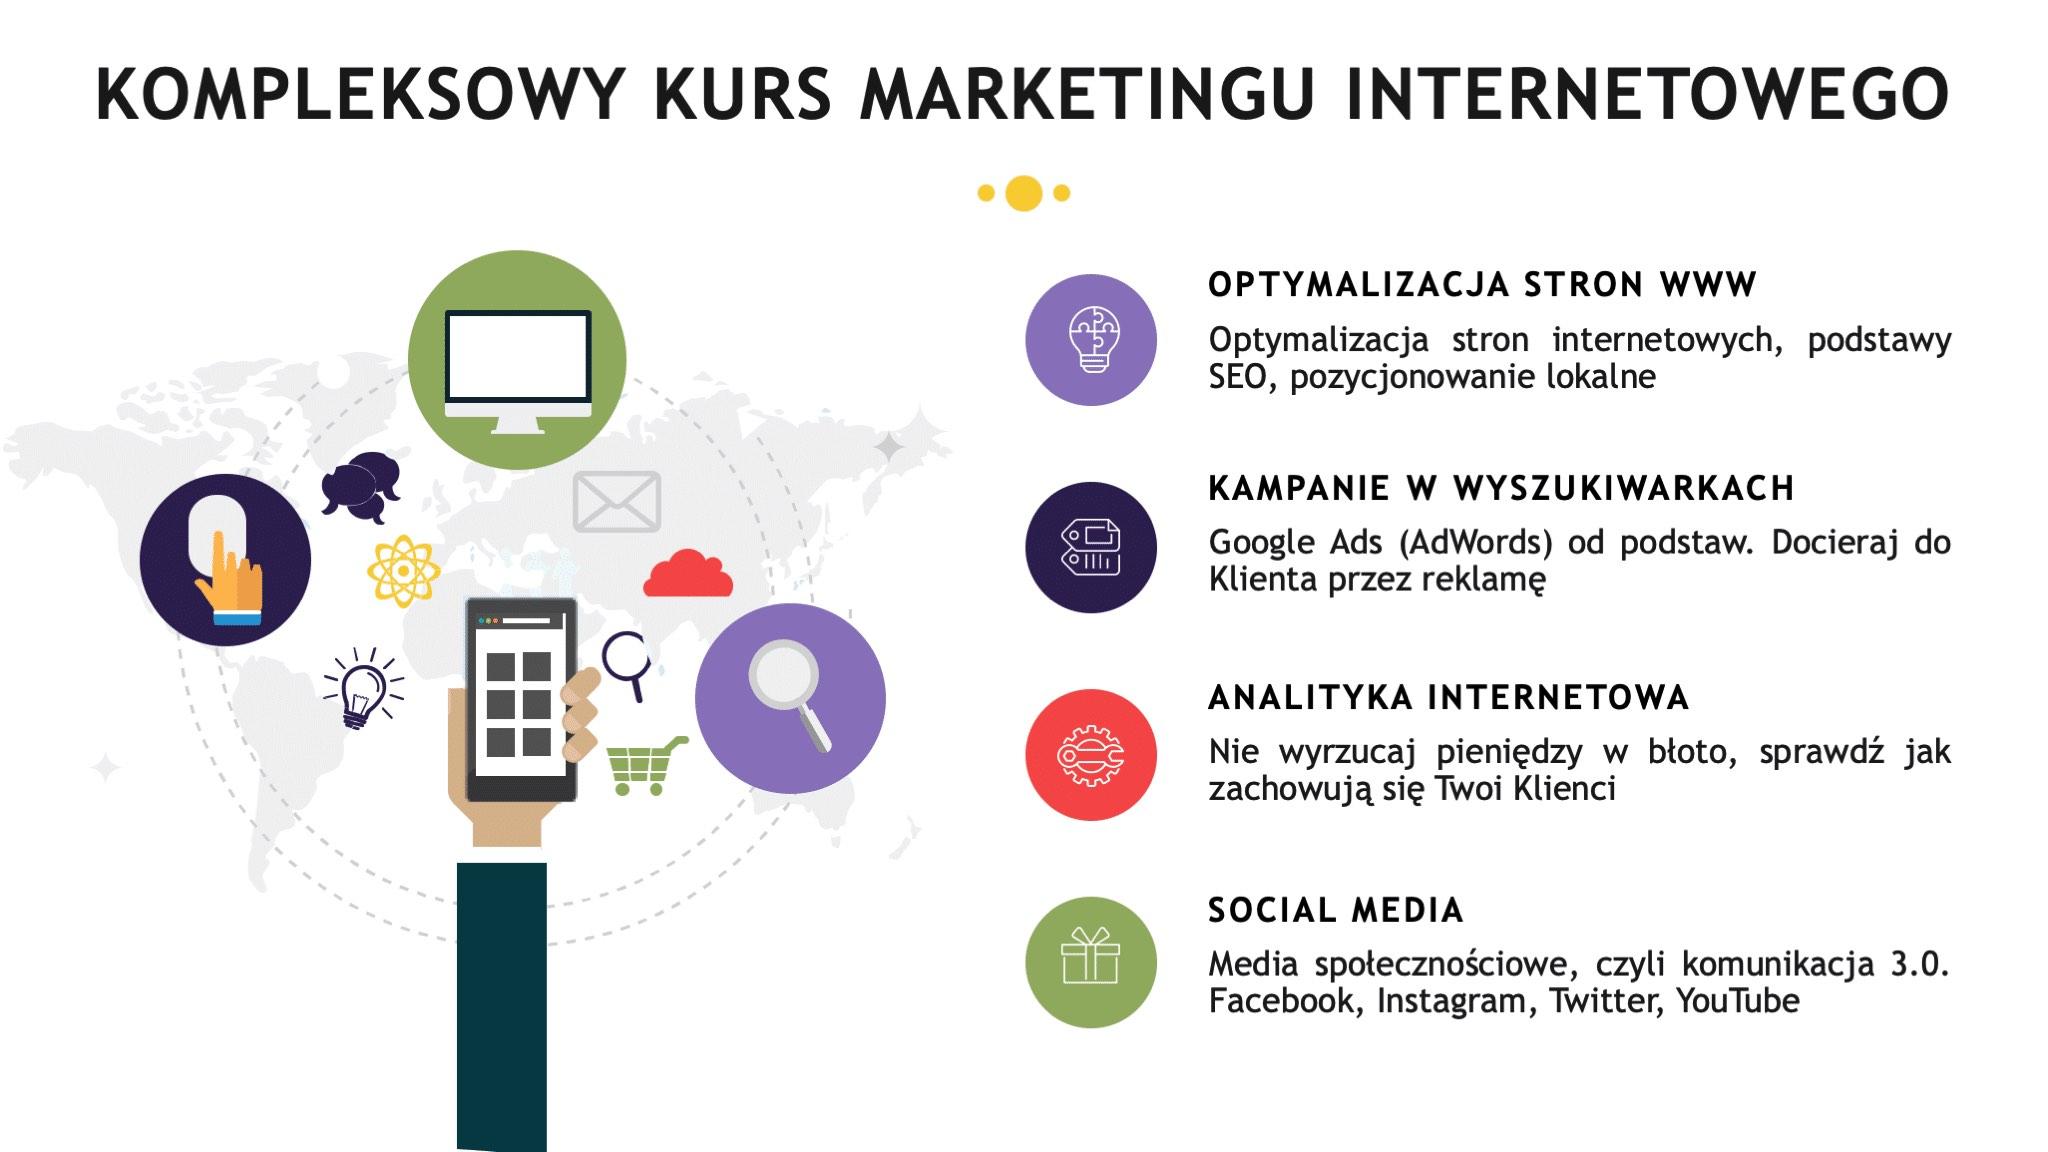 kurs marketingu internetowego